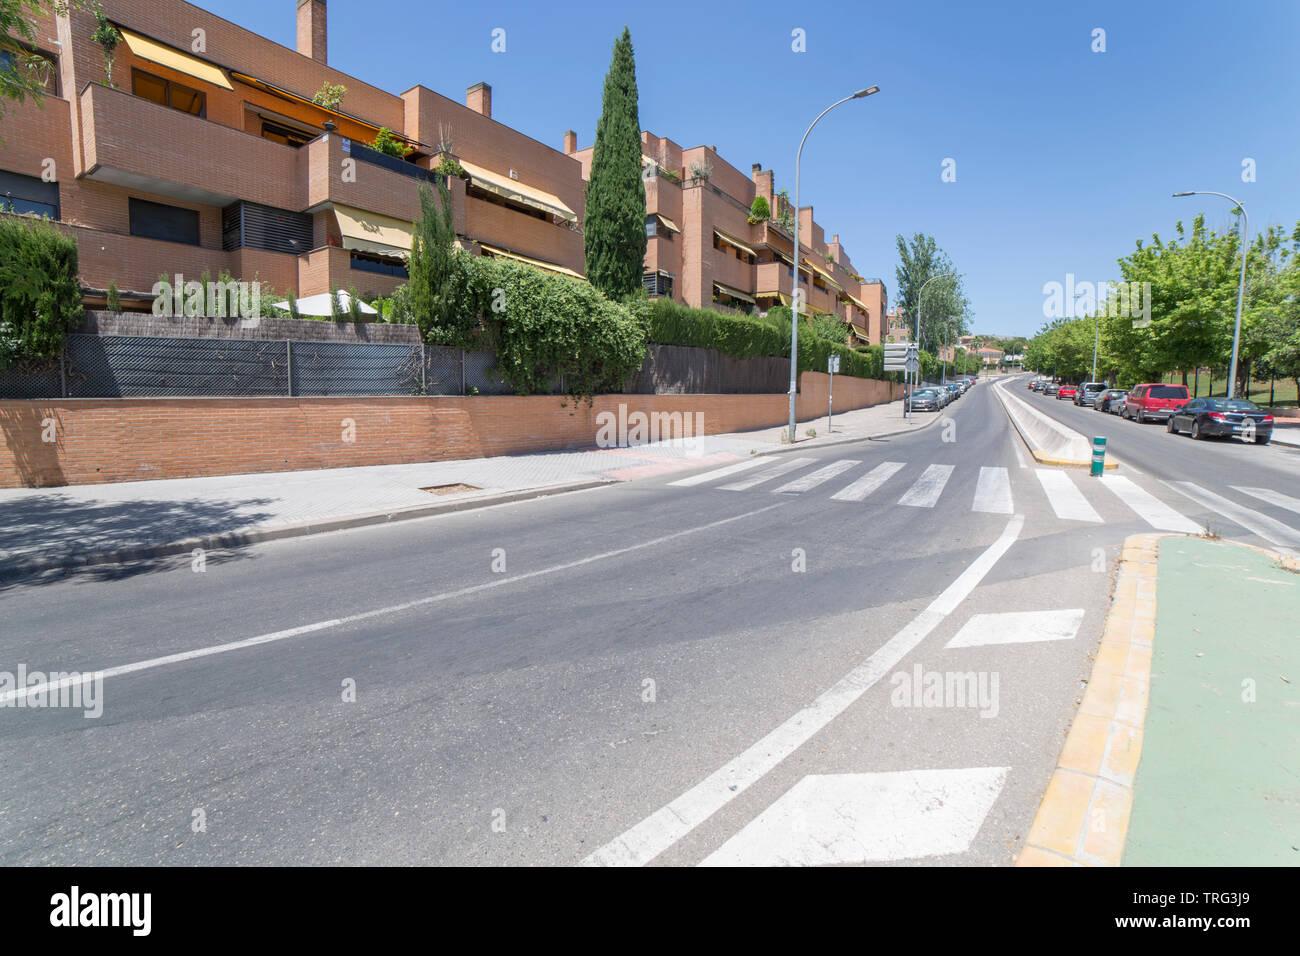 Cordoba, Spain - May 30th, 2019: Norte Sierra district. Cordoba, Spain. Escultor Ramon Barba street - Stock Image